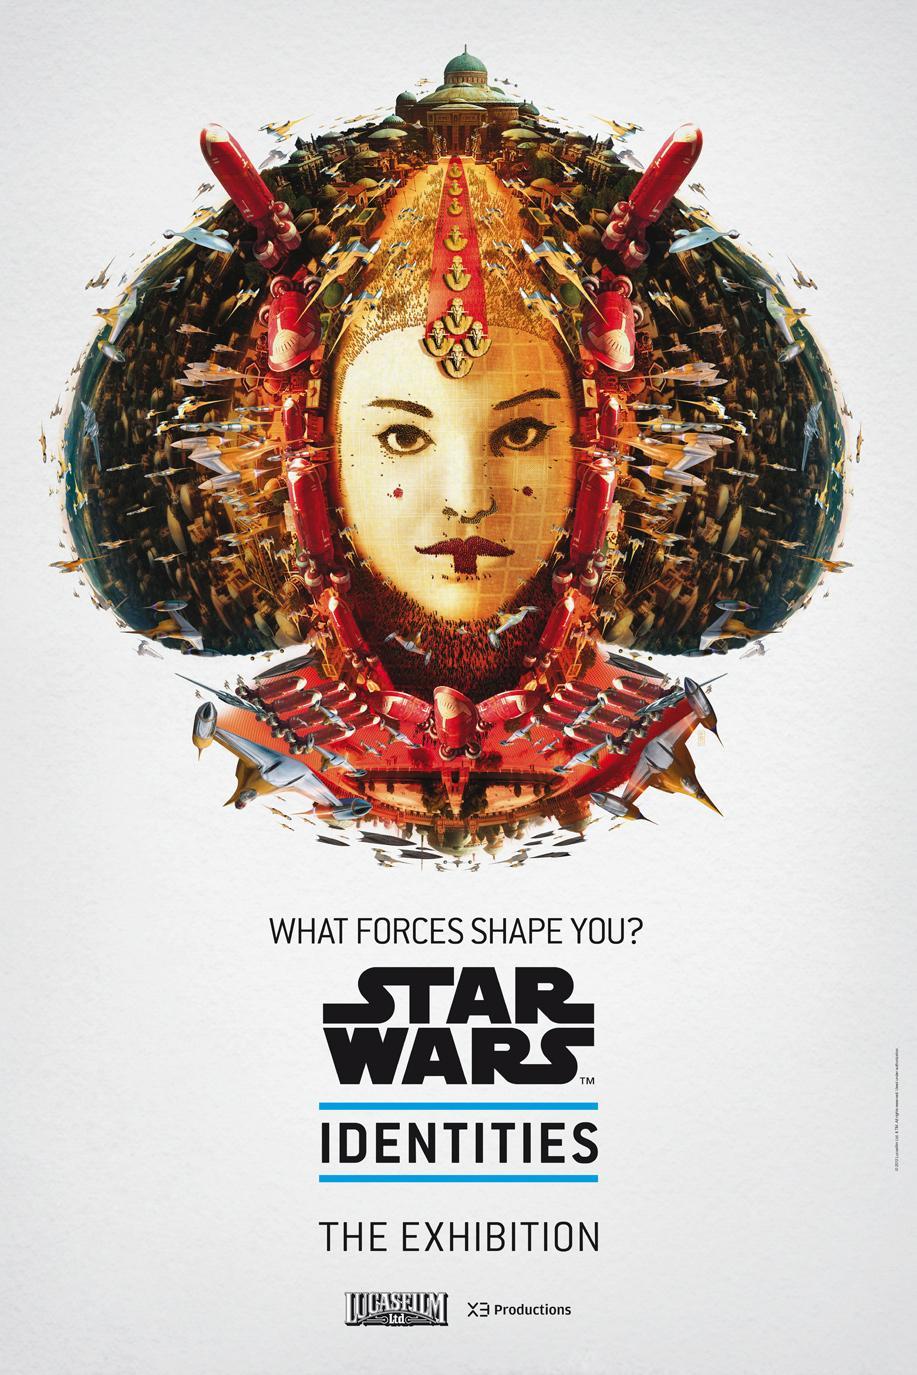 Star Wars Outdoor Ad -  The Exhibition, Amidala